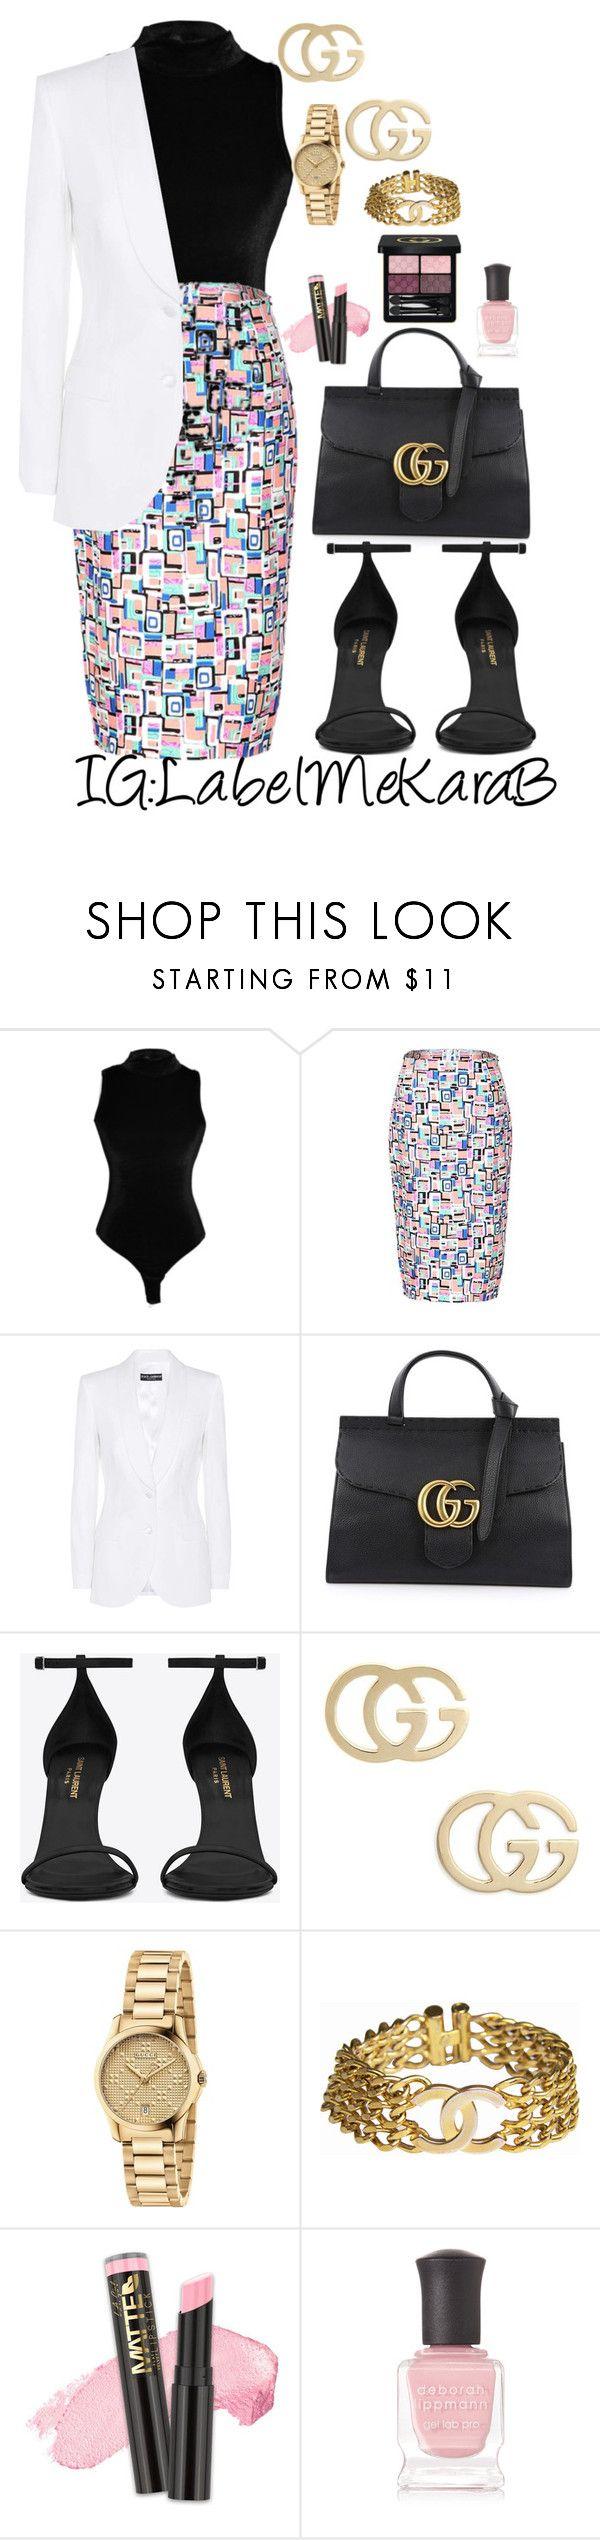 """KB062"" by labelmekarab on Polyvore featuring Dolce&Gabbana, Gucci, Yves Saint Laurent, Chanel, L.A. Girl, Deborah Lippmann, Pink, YSL, gucci and LabelMeKaraB"